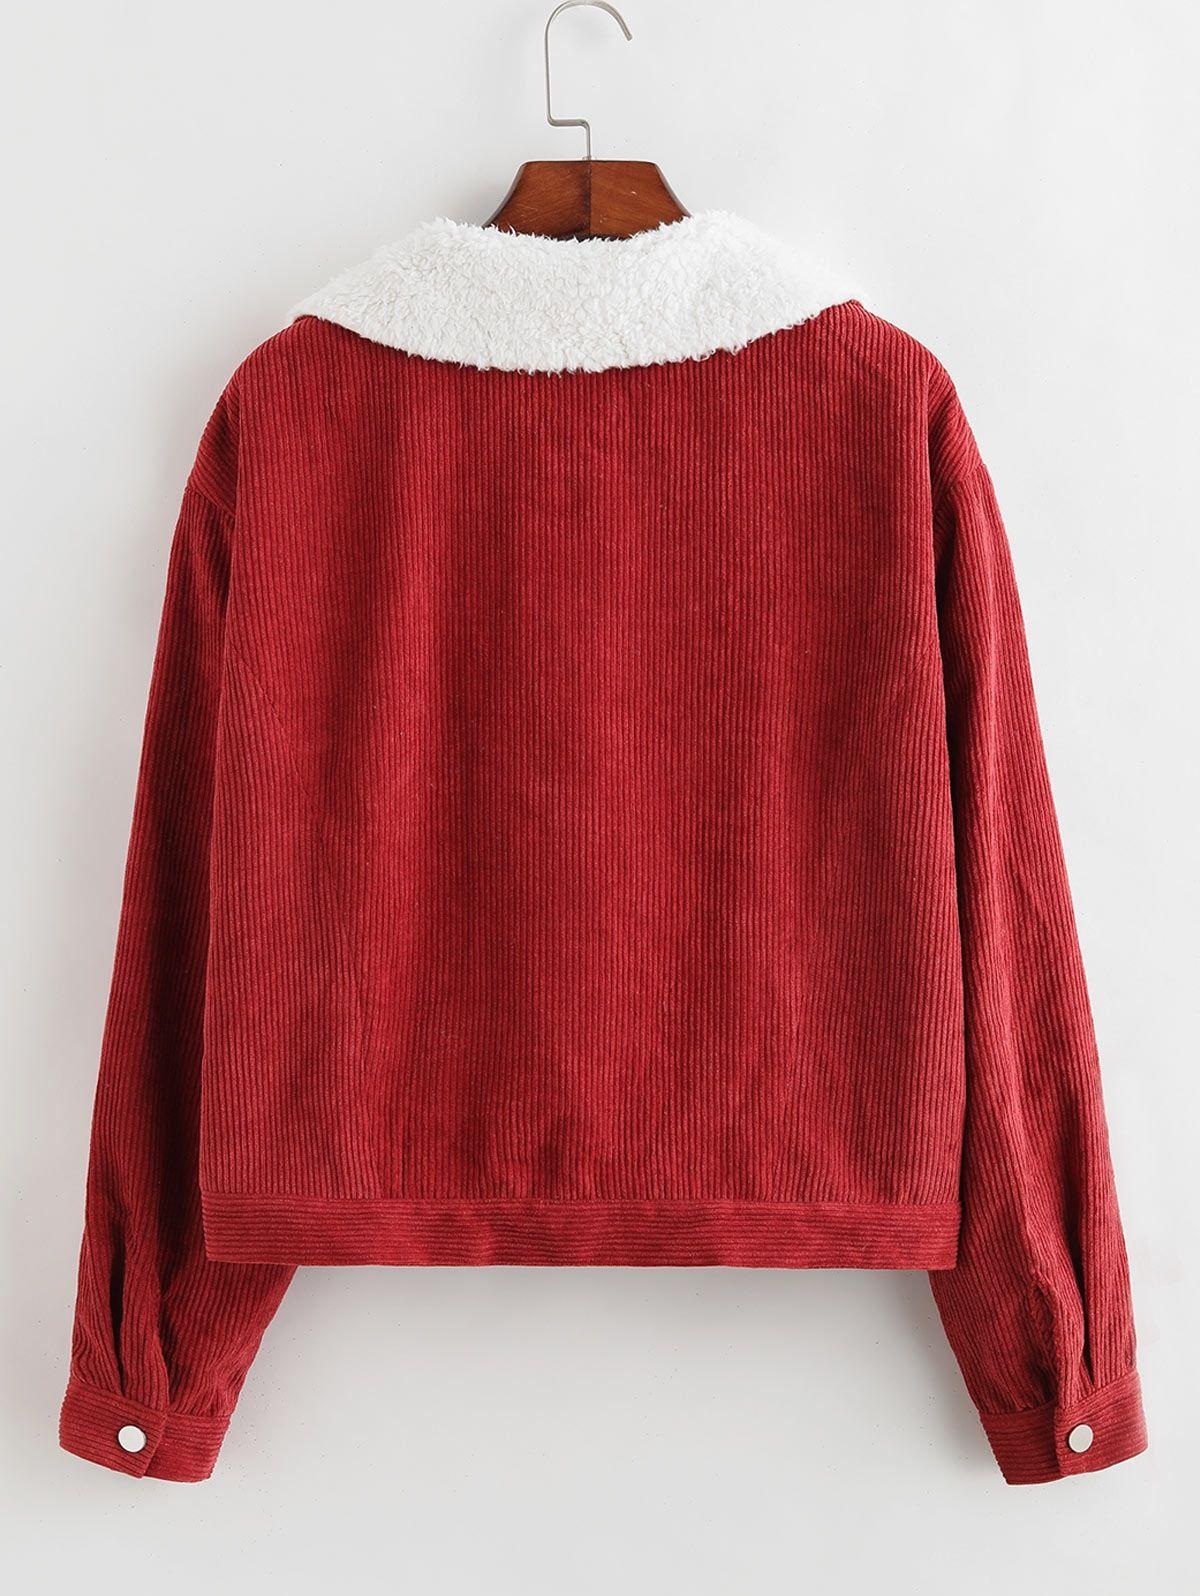 Zaful Faux Shearling Lining Corduroy Jacket Red Wine Affiliate Shearling Lining Zaful Faux Red Ad With Images Hooded Denim Jacket Long Coat Fur Hood Parka